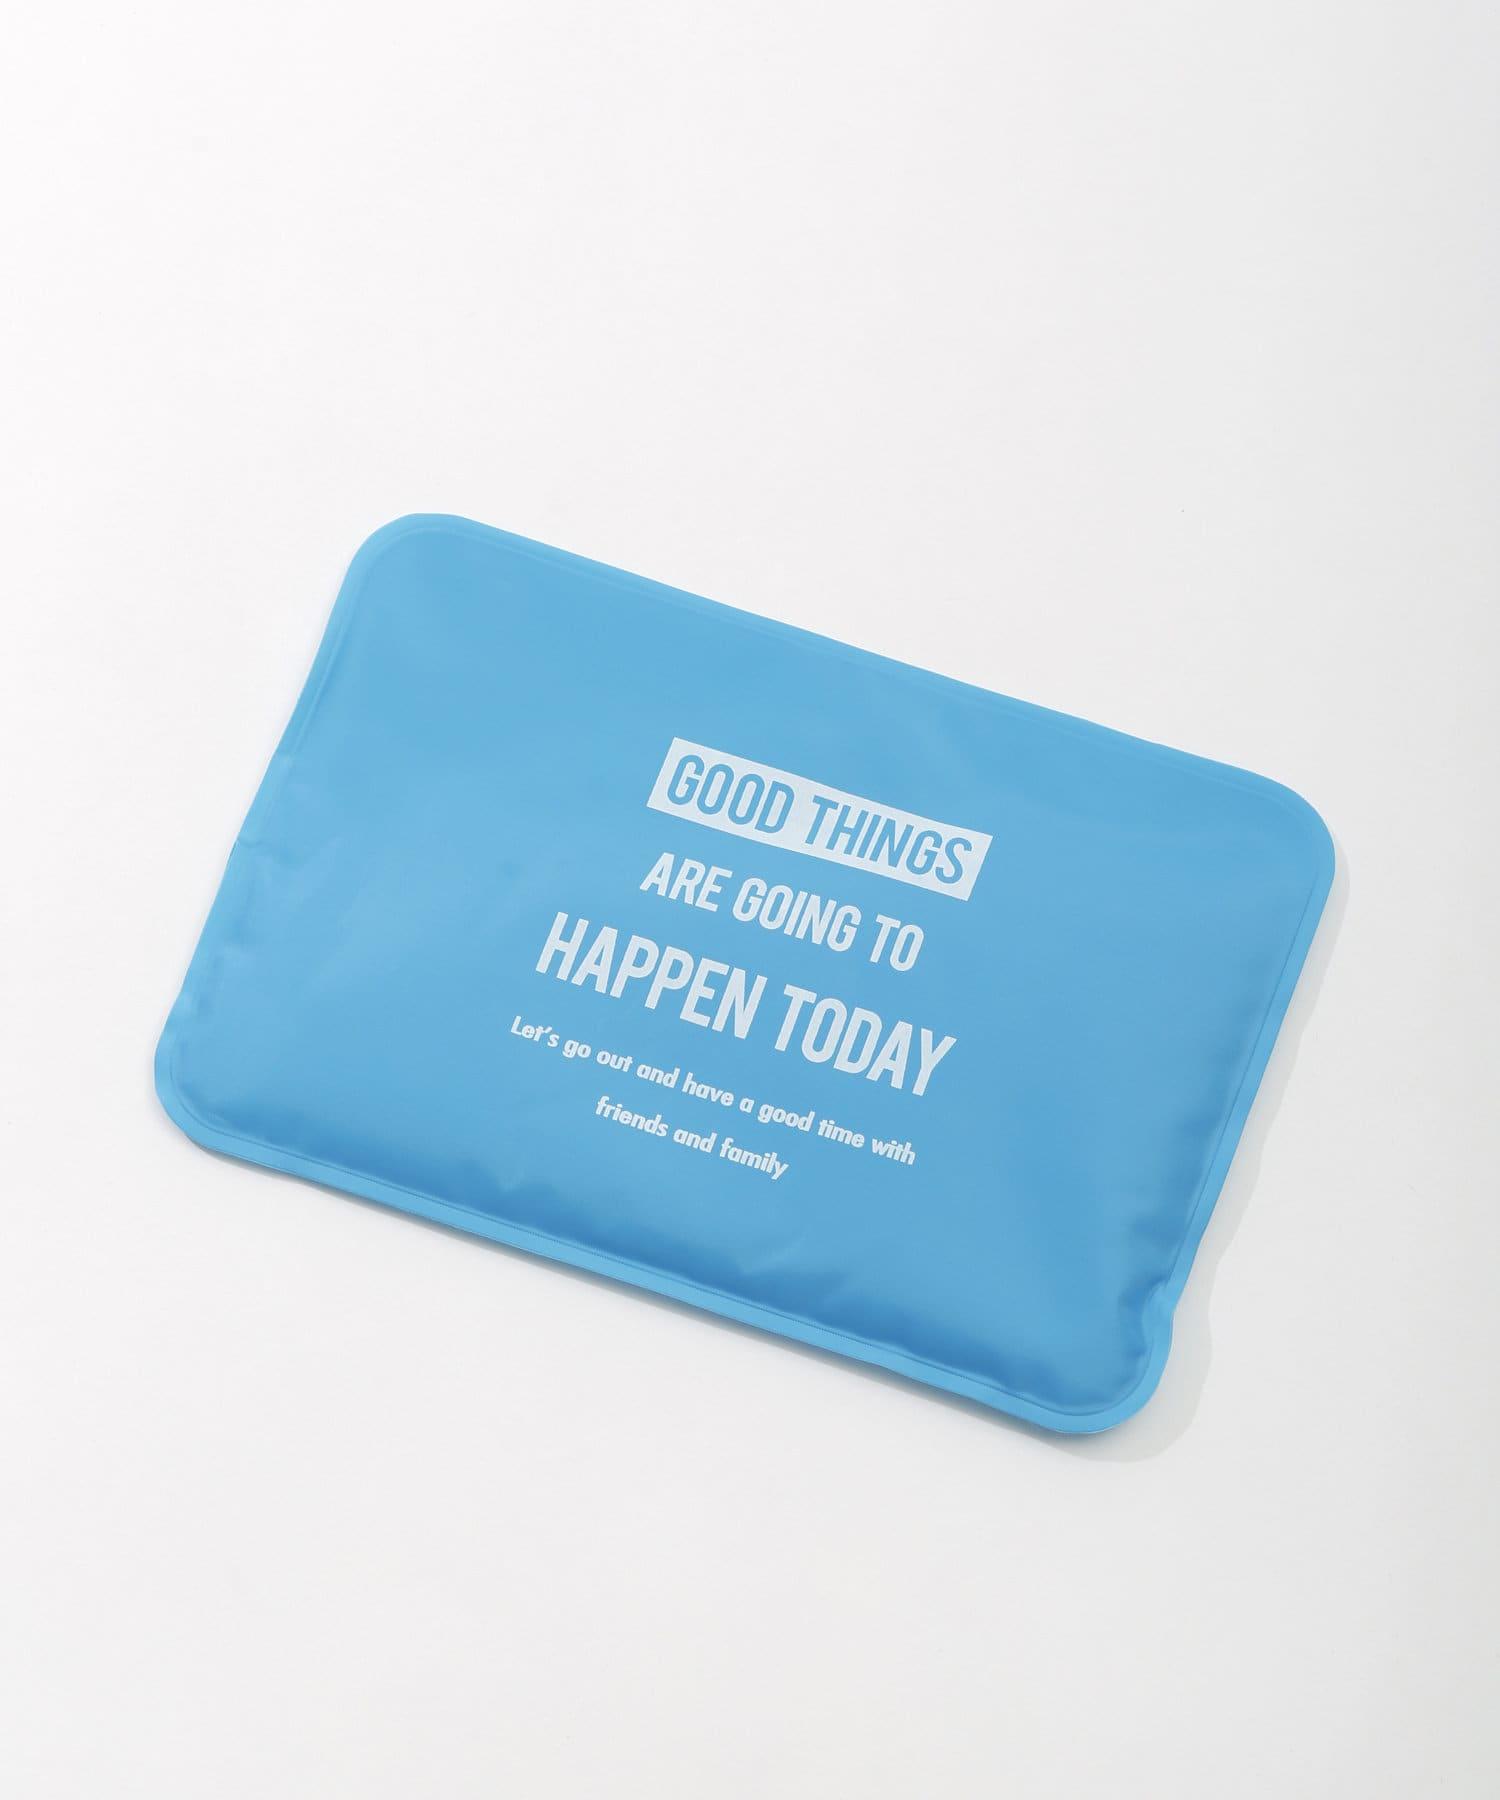 3COINS(スリーコインズ) ライフスタイル 【熱中症対策】保冷剤ピロー ブルー